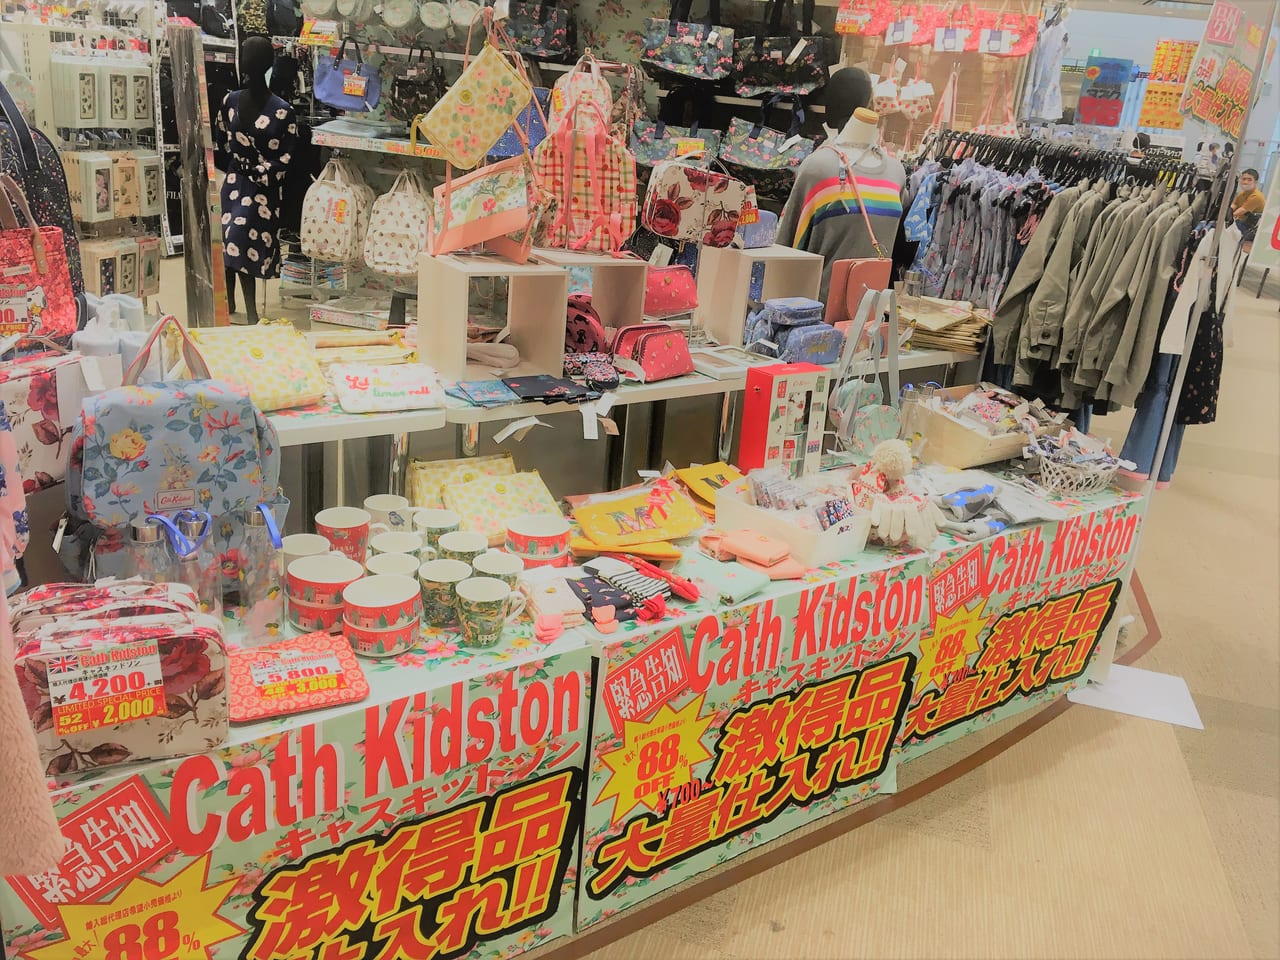 MEGAドン・キホーテUNY稲沢東店のキャスキッドソン売り場